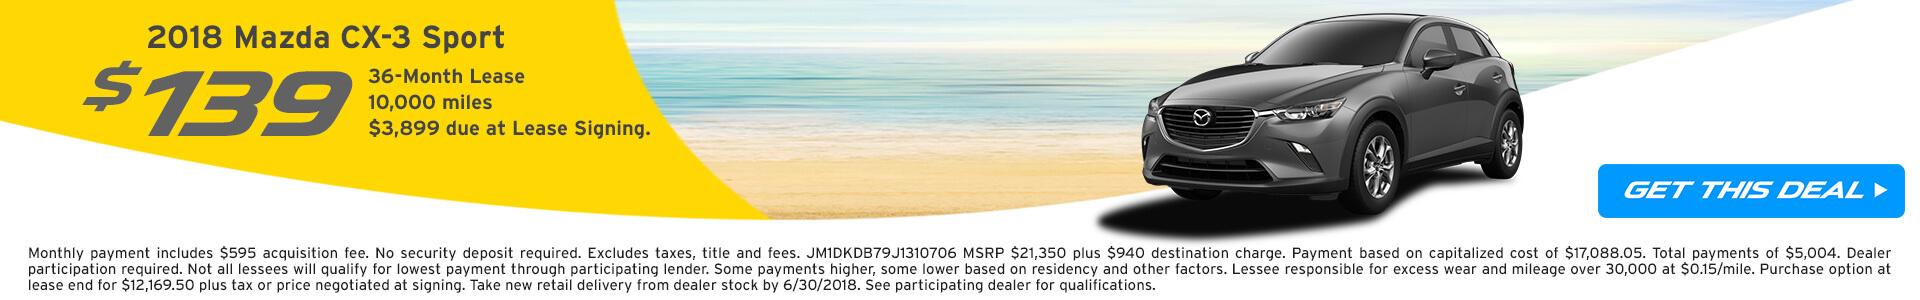 CX-3 Lease $139